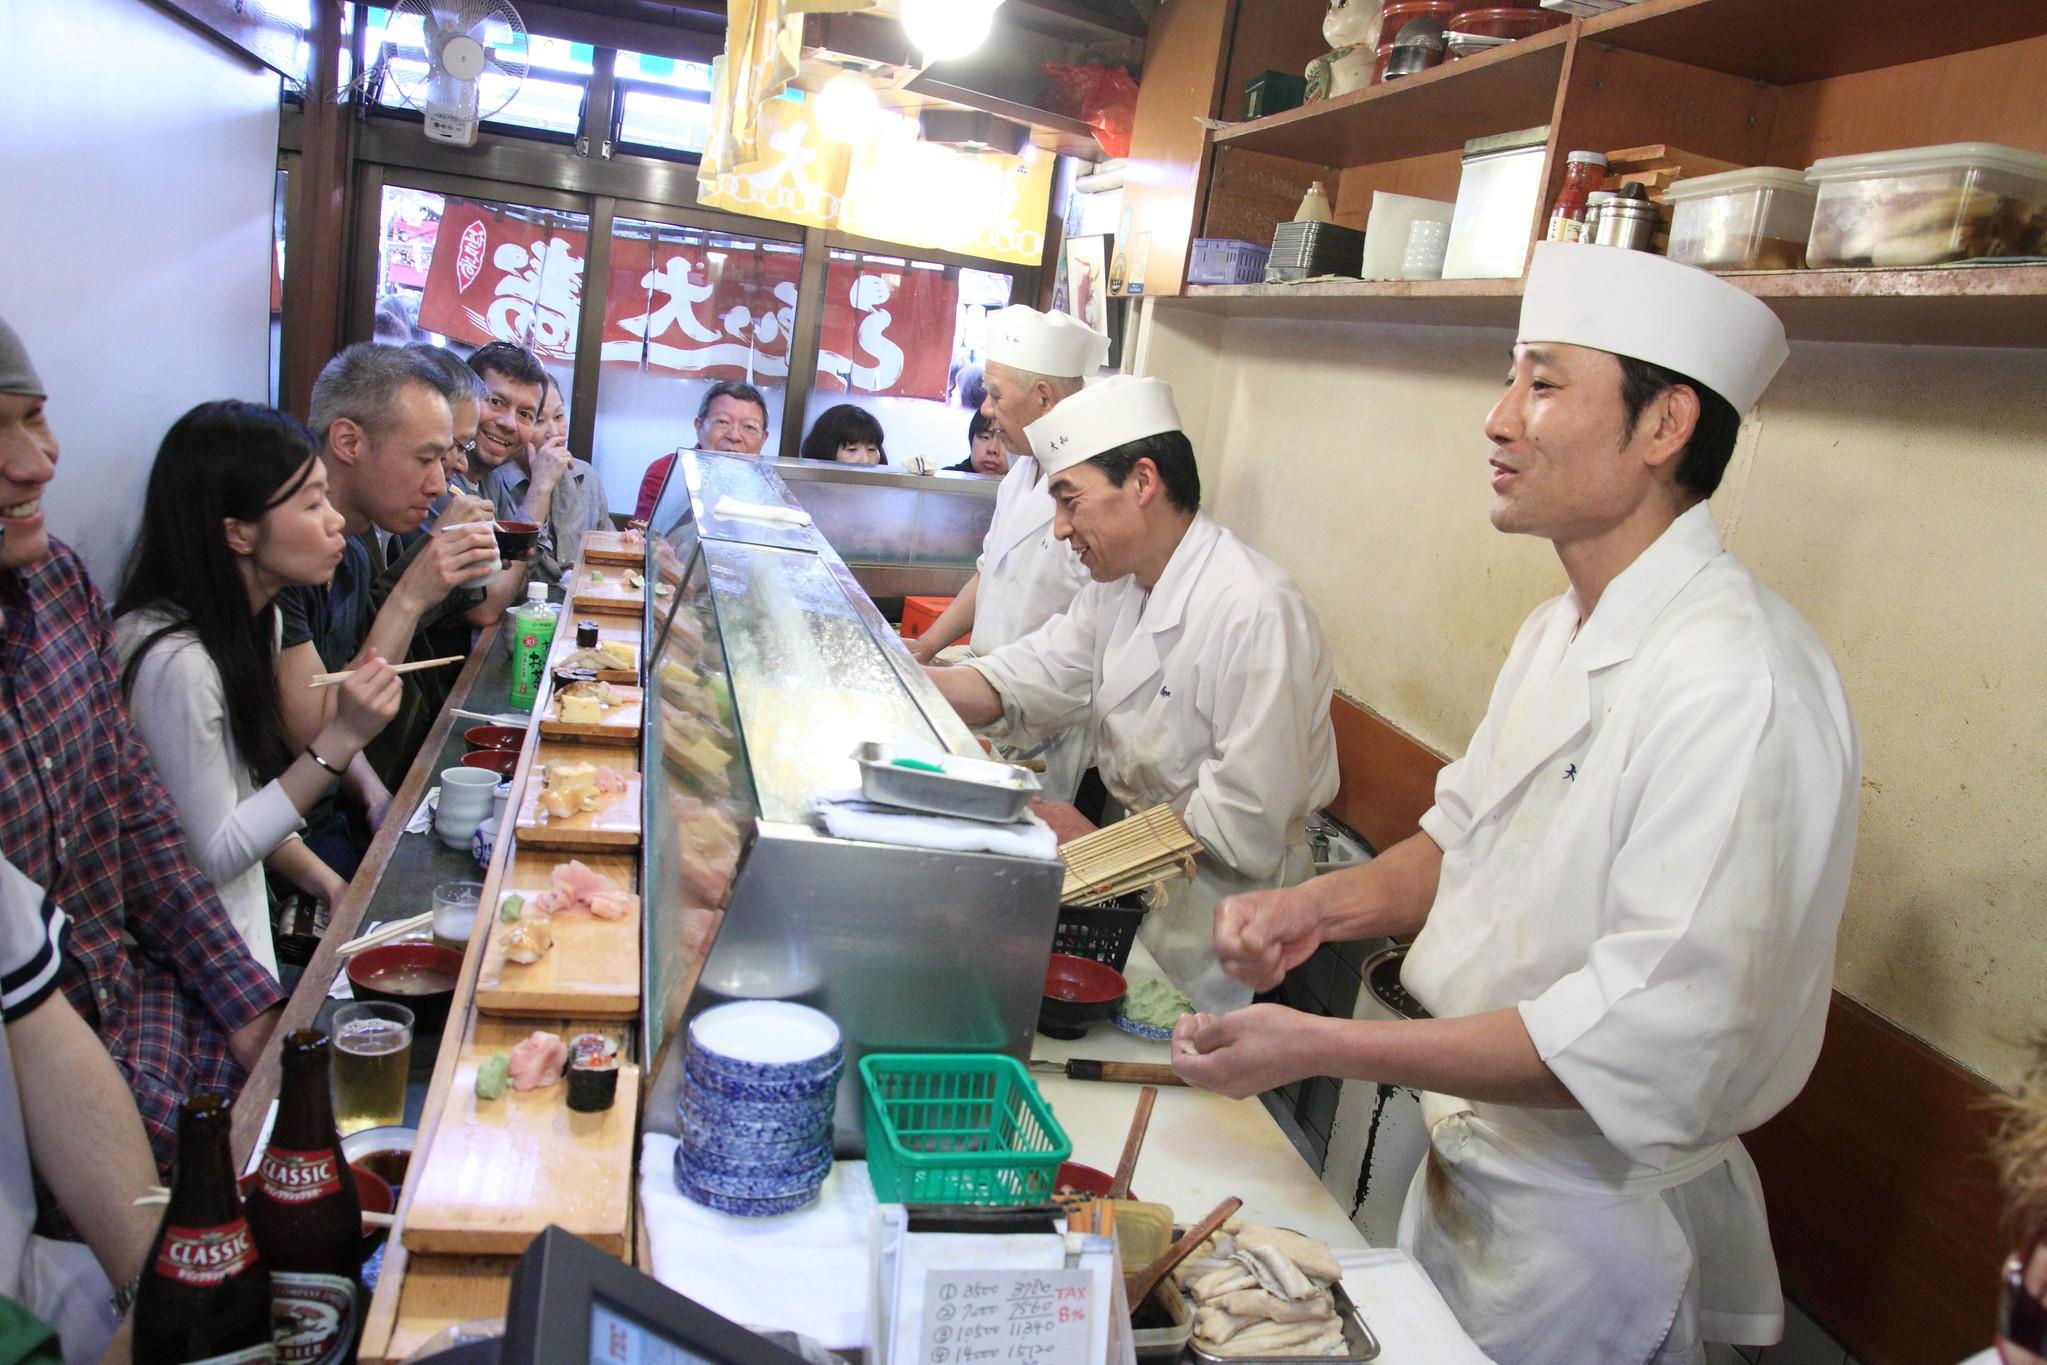 06102019_galeria-tsukiji stuart hamilton 02.jpg